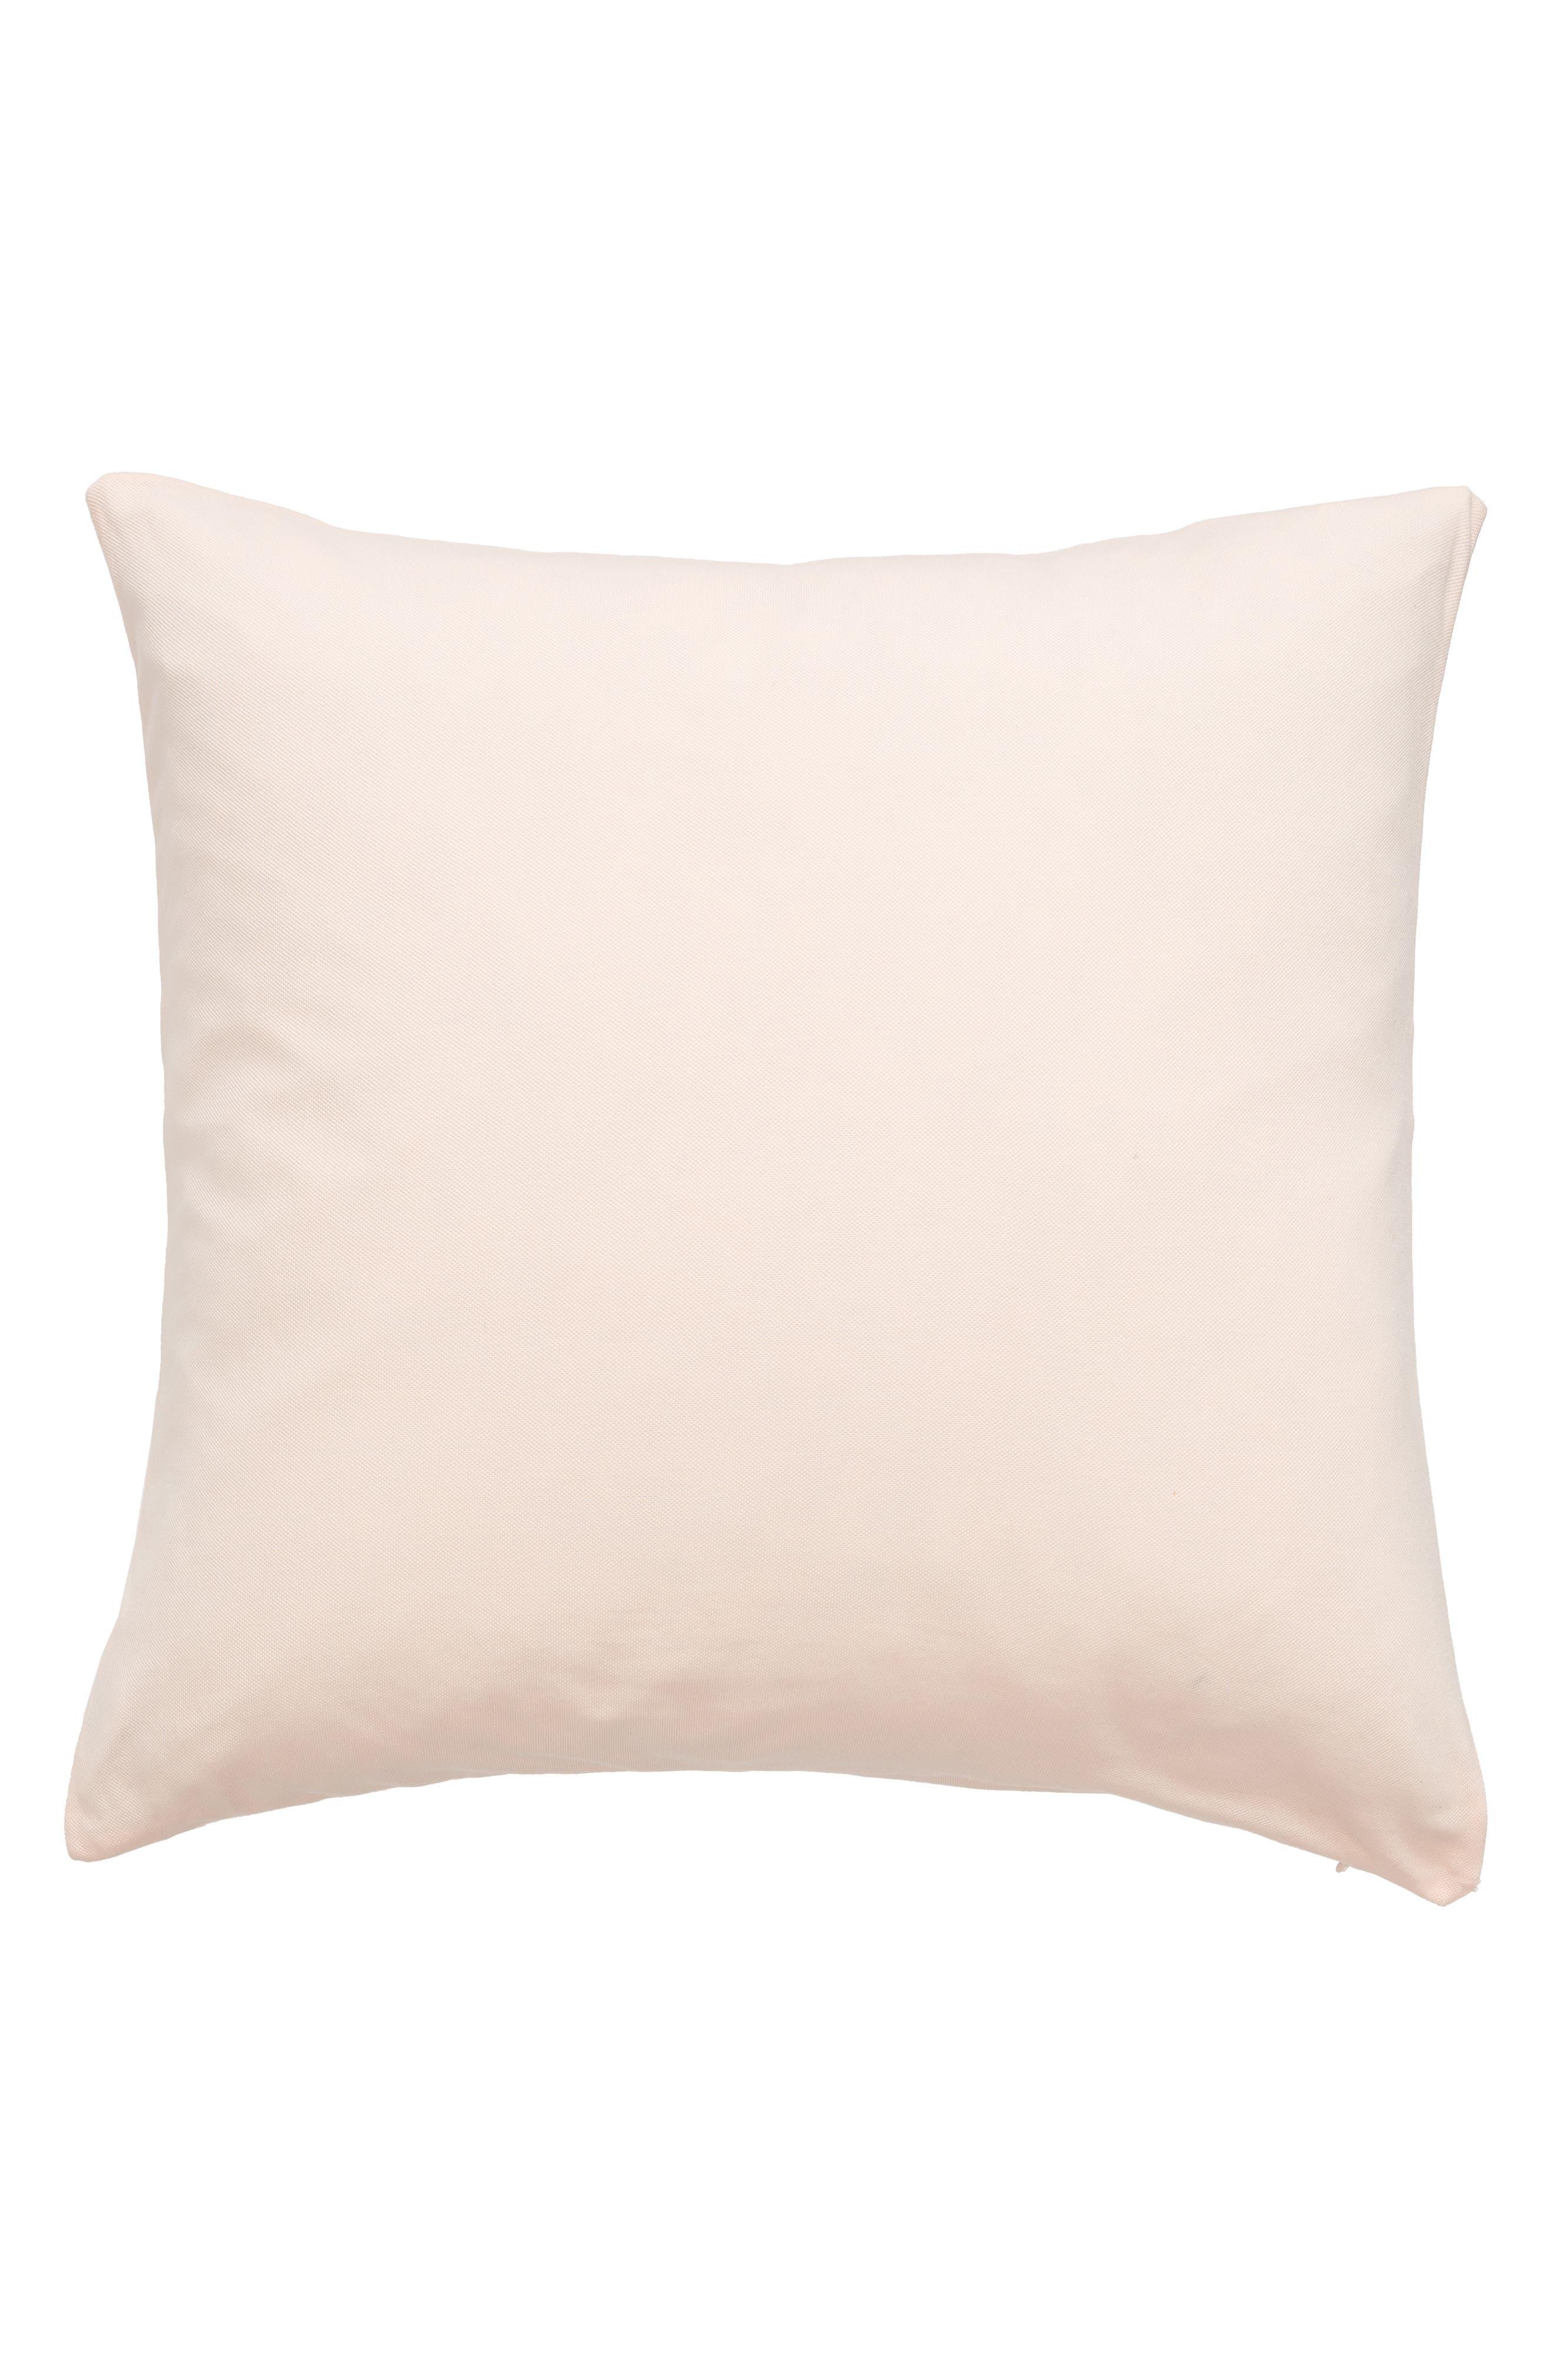 Home Jacob Accent Pillow,                             Main thumbnail 1, color,                             650